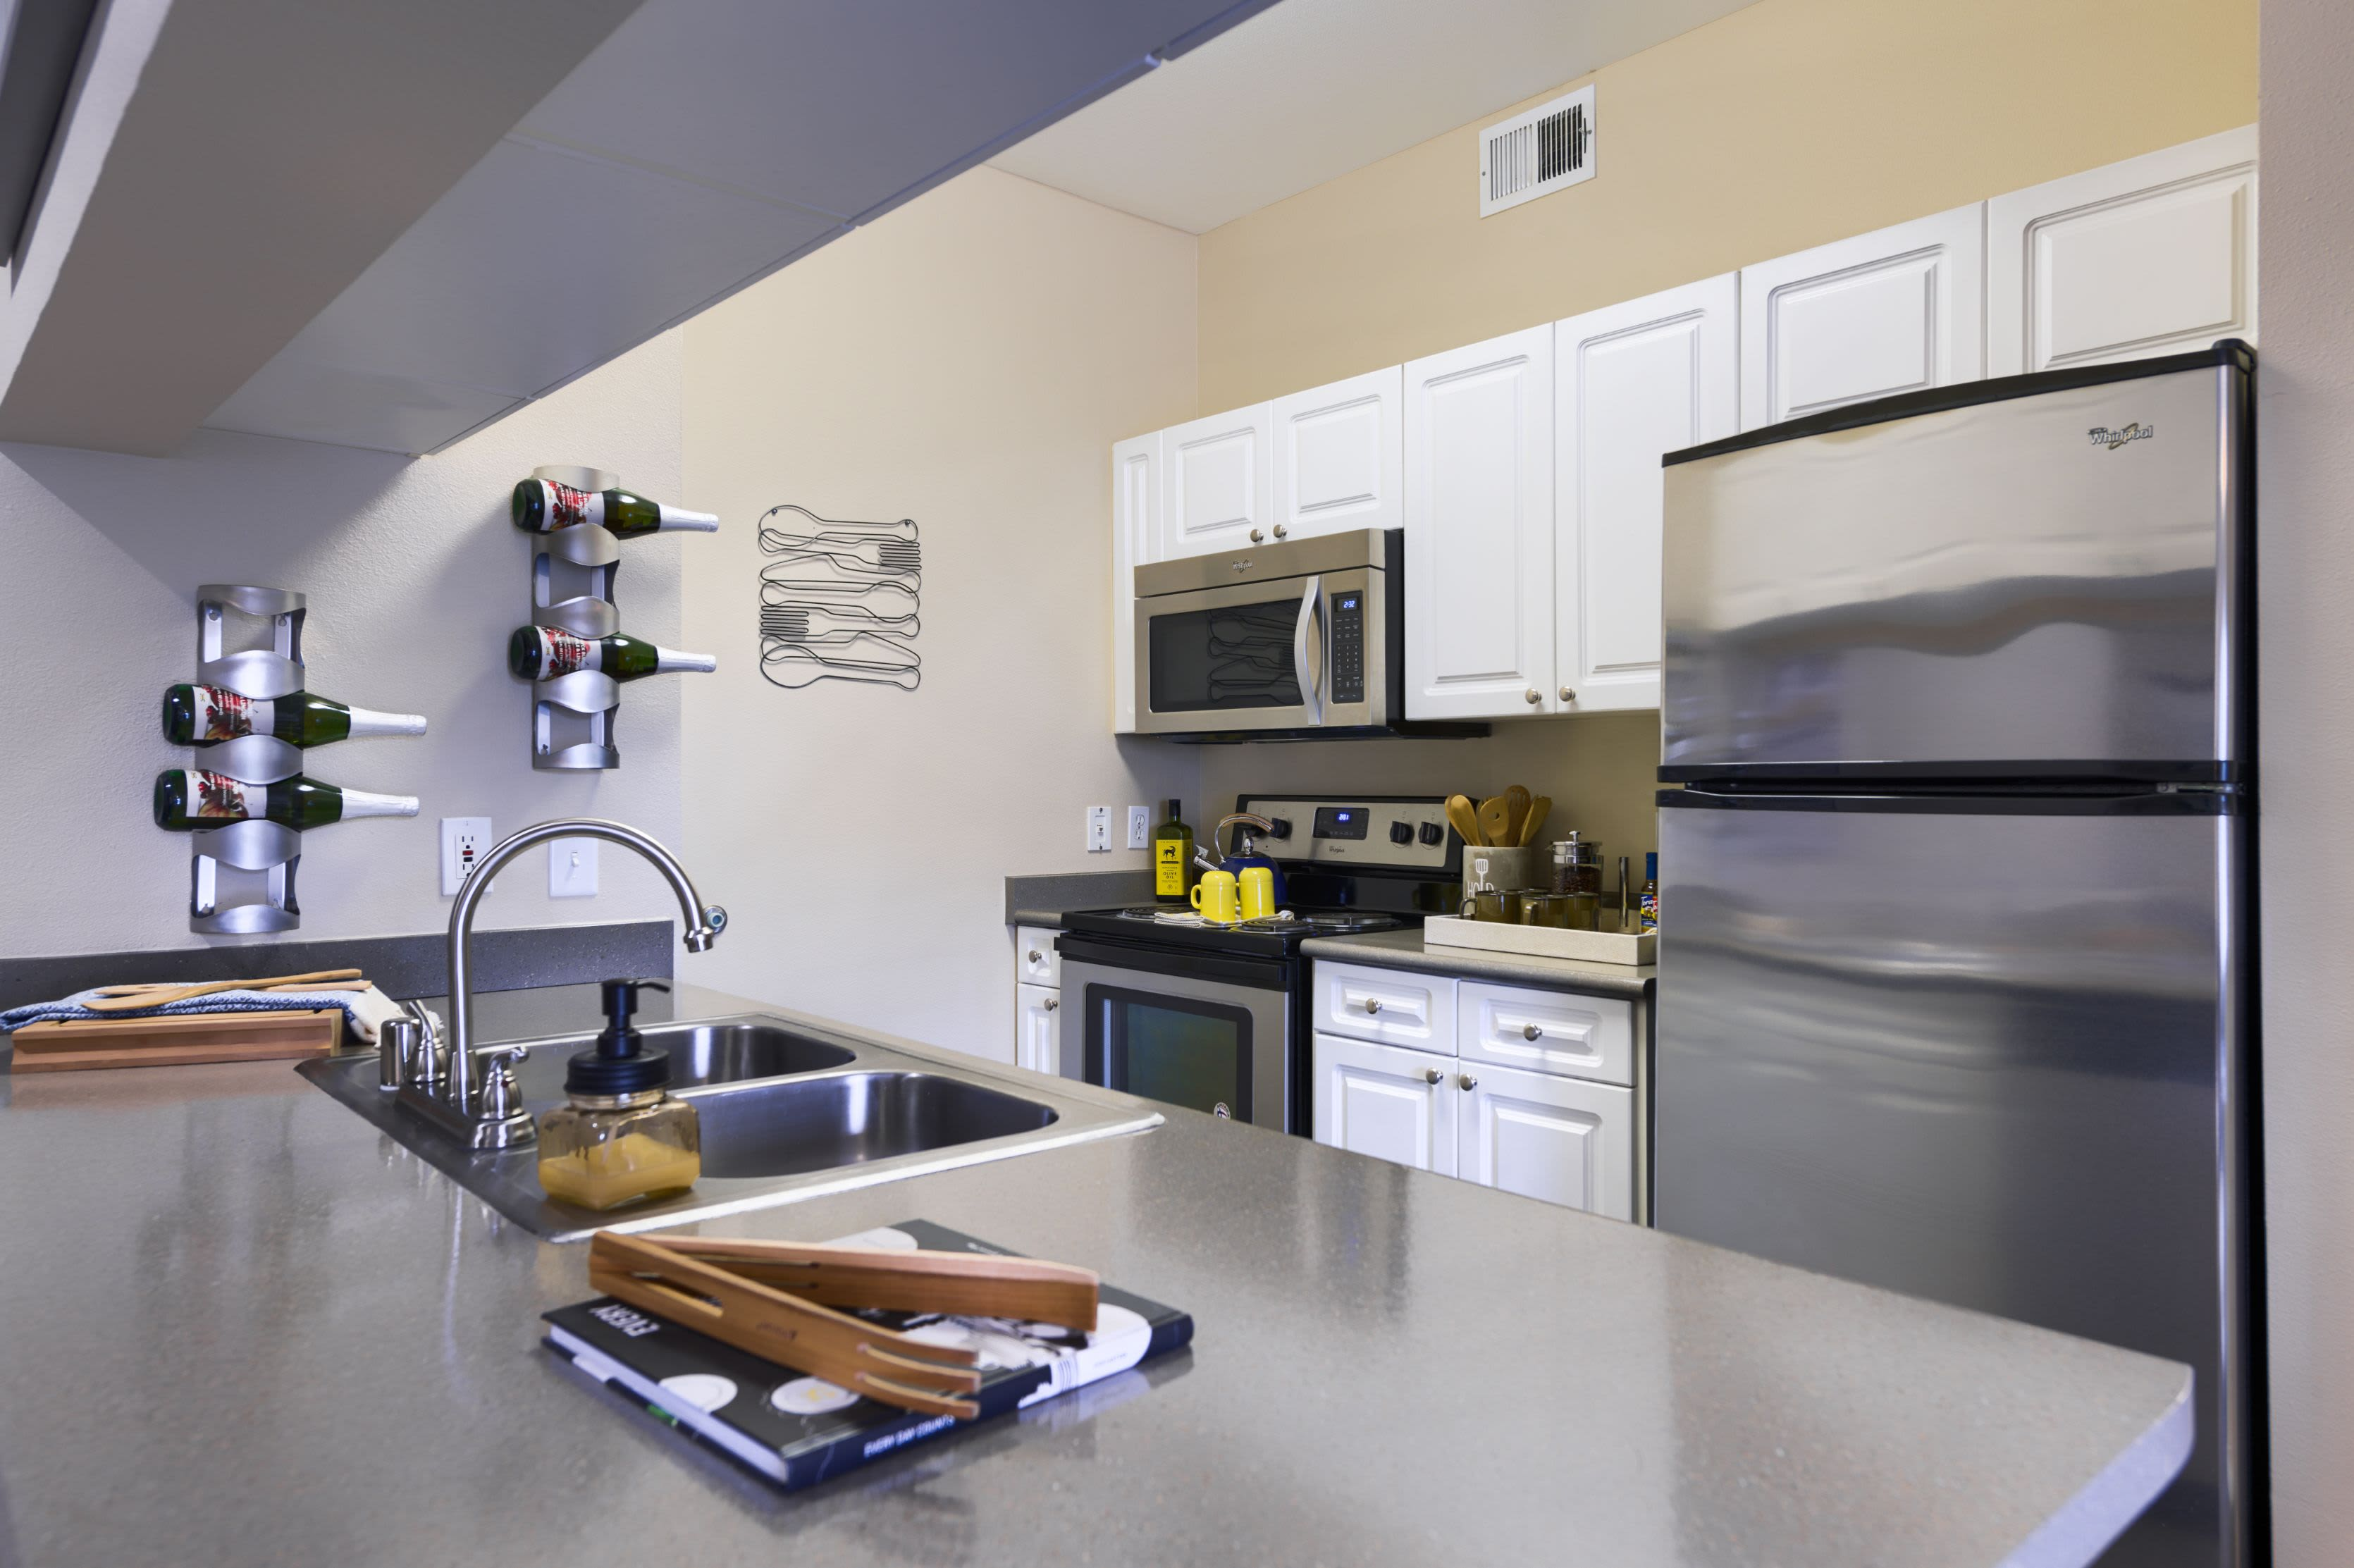 30-Day No-Fault Guarantee at Whisper Creek Apartment Homes in Lakewood, Colorado